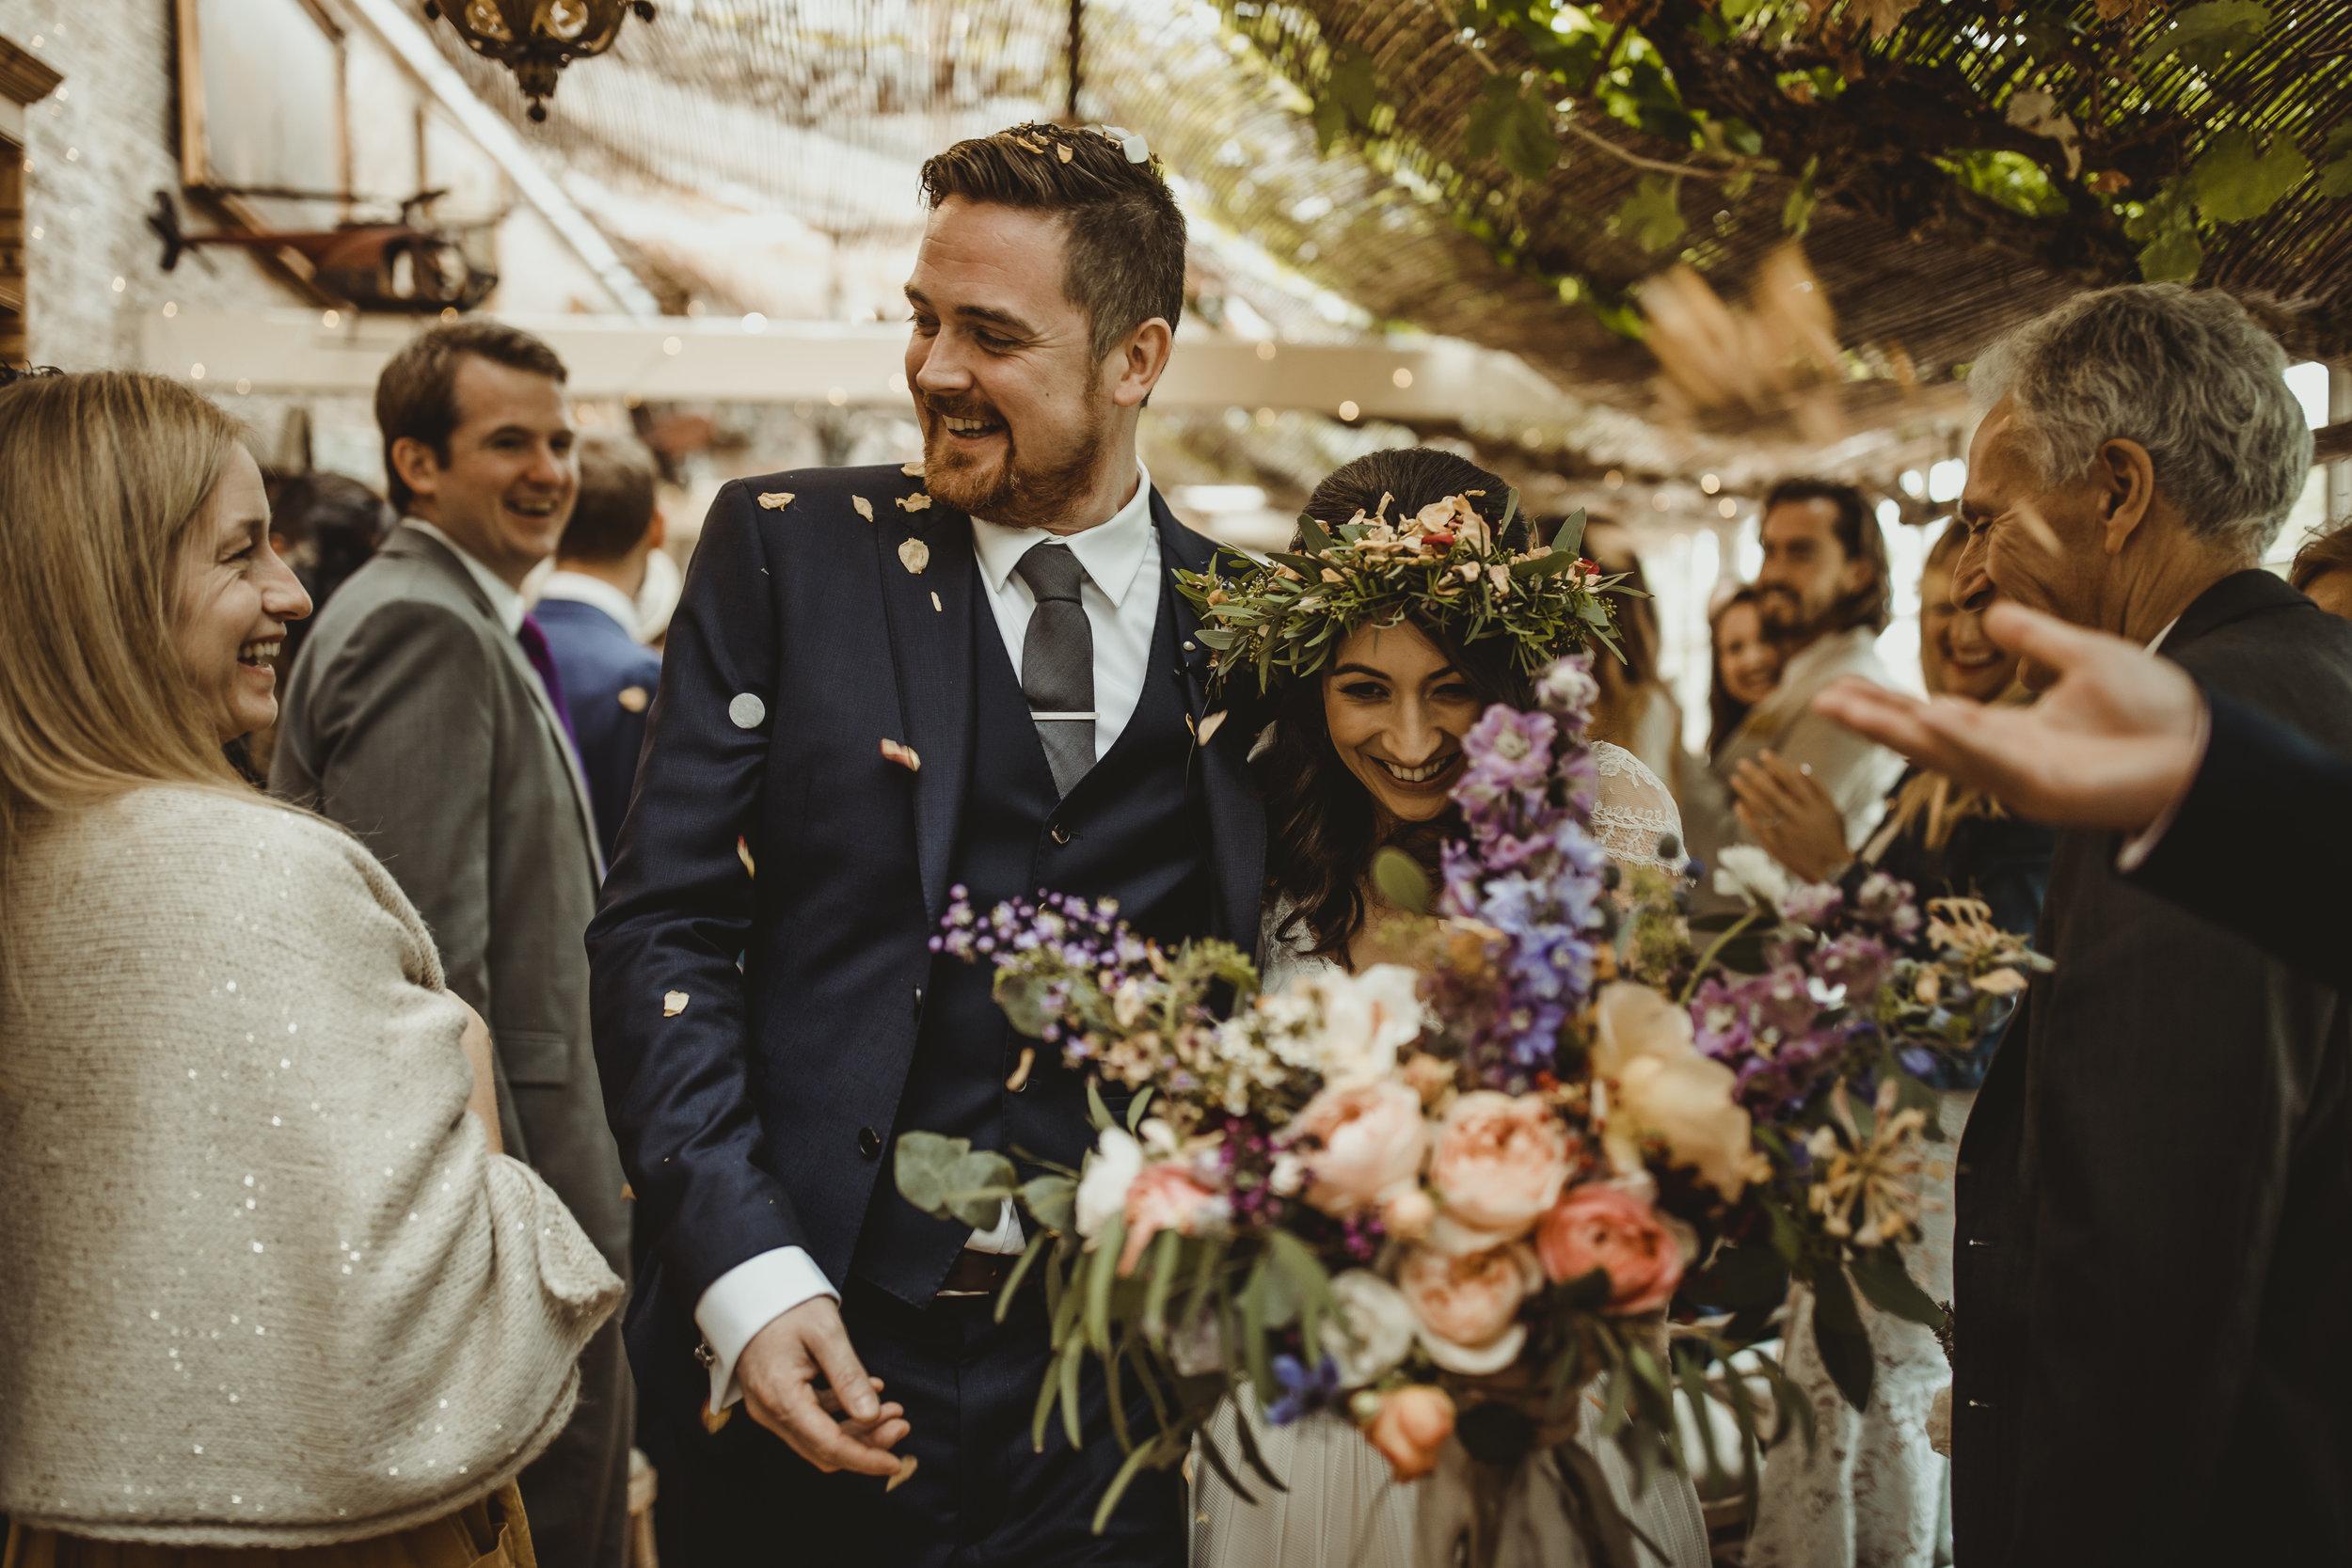 N&J_YORKSHIRE_WEDDING_PHOTOGRAPHER_MALTON_LEEDS_SHEFFIELD-493.JPG